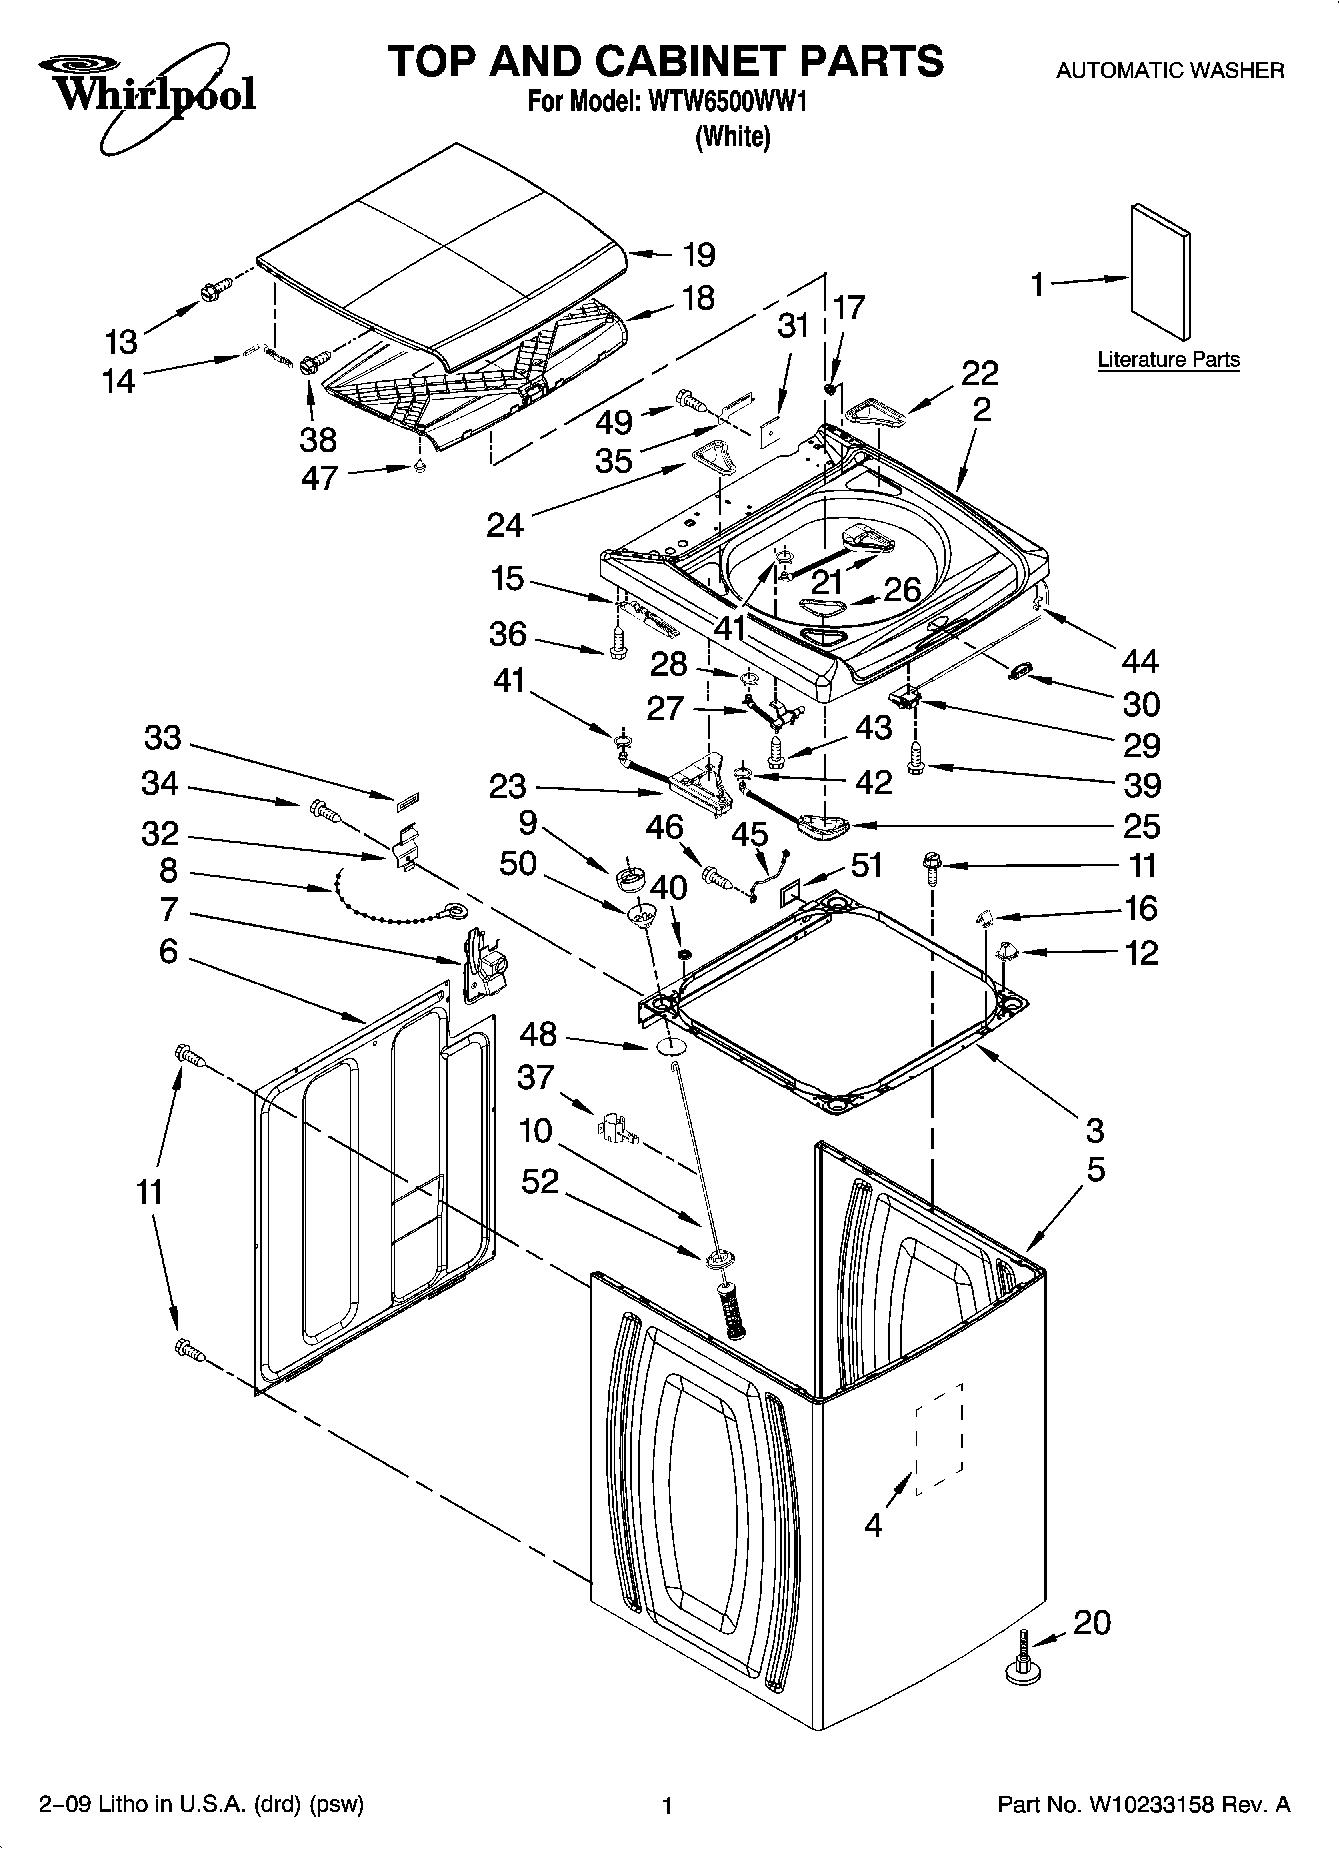 Whirlpool Tub Wiring Diagram Auto Electrical Automatic Washer Optional Parts Model Wtw57esvw1 Pump